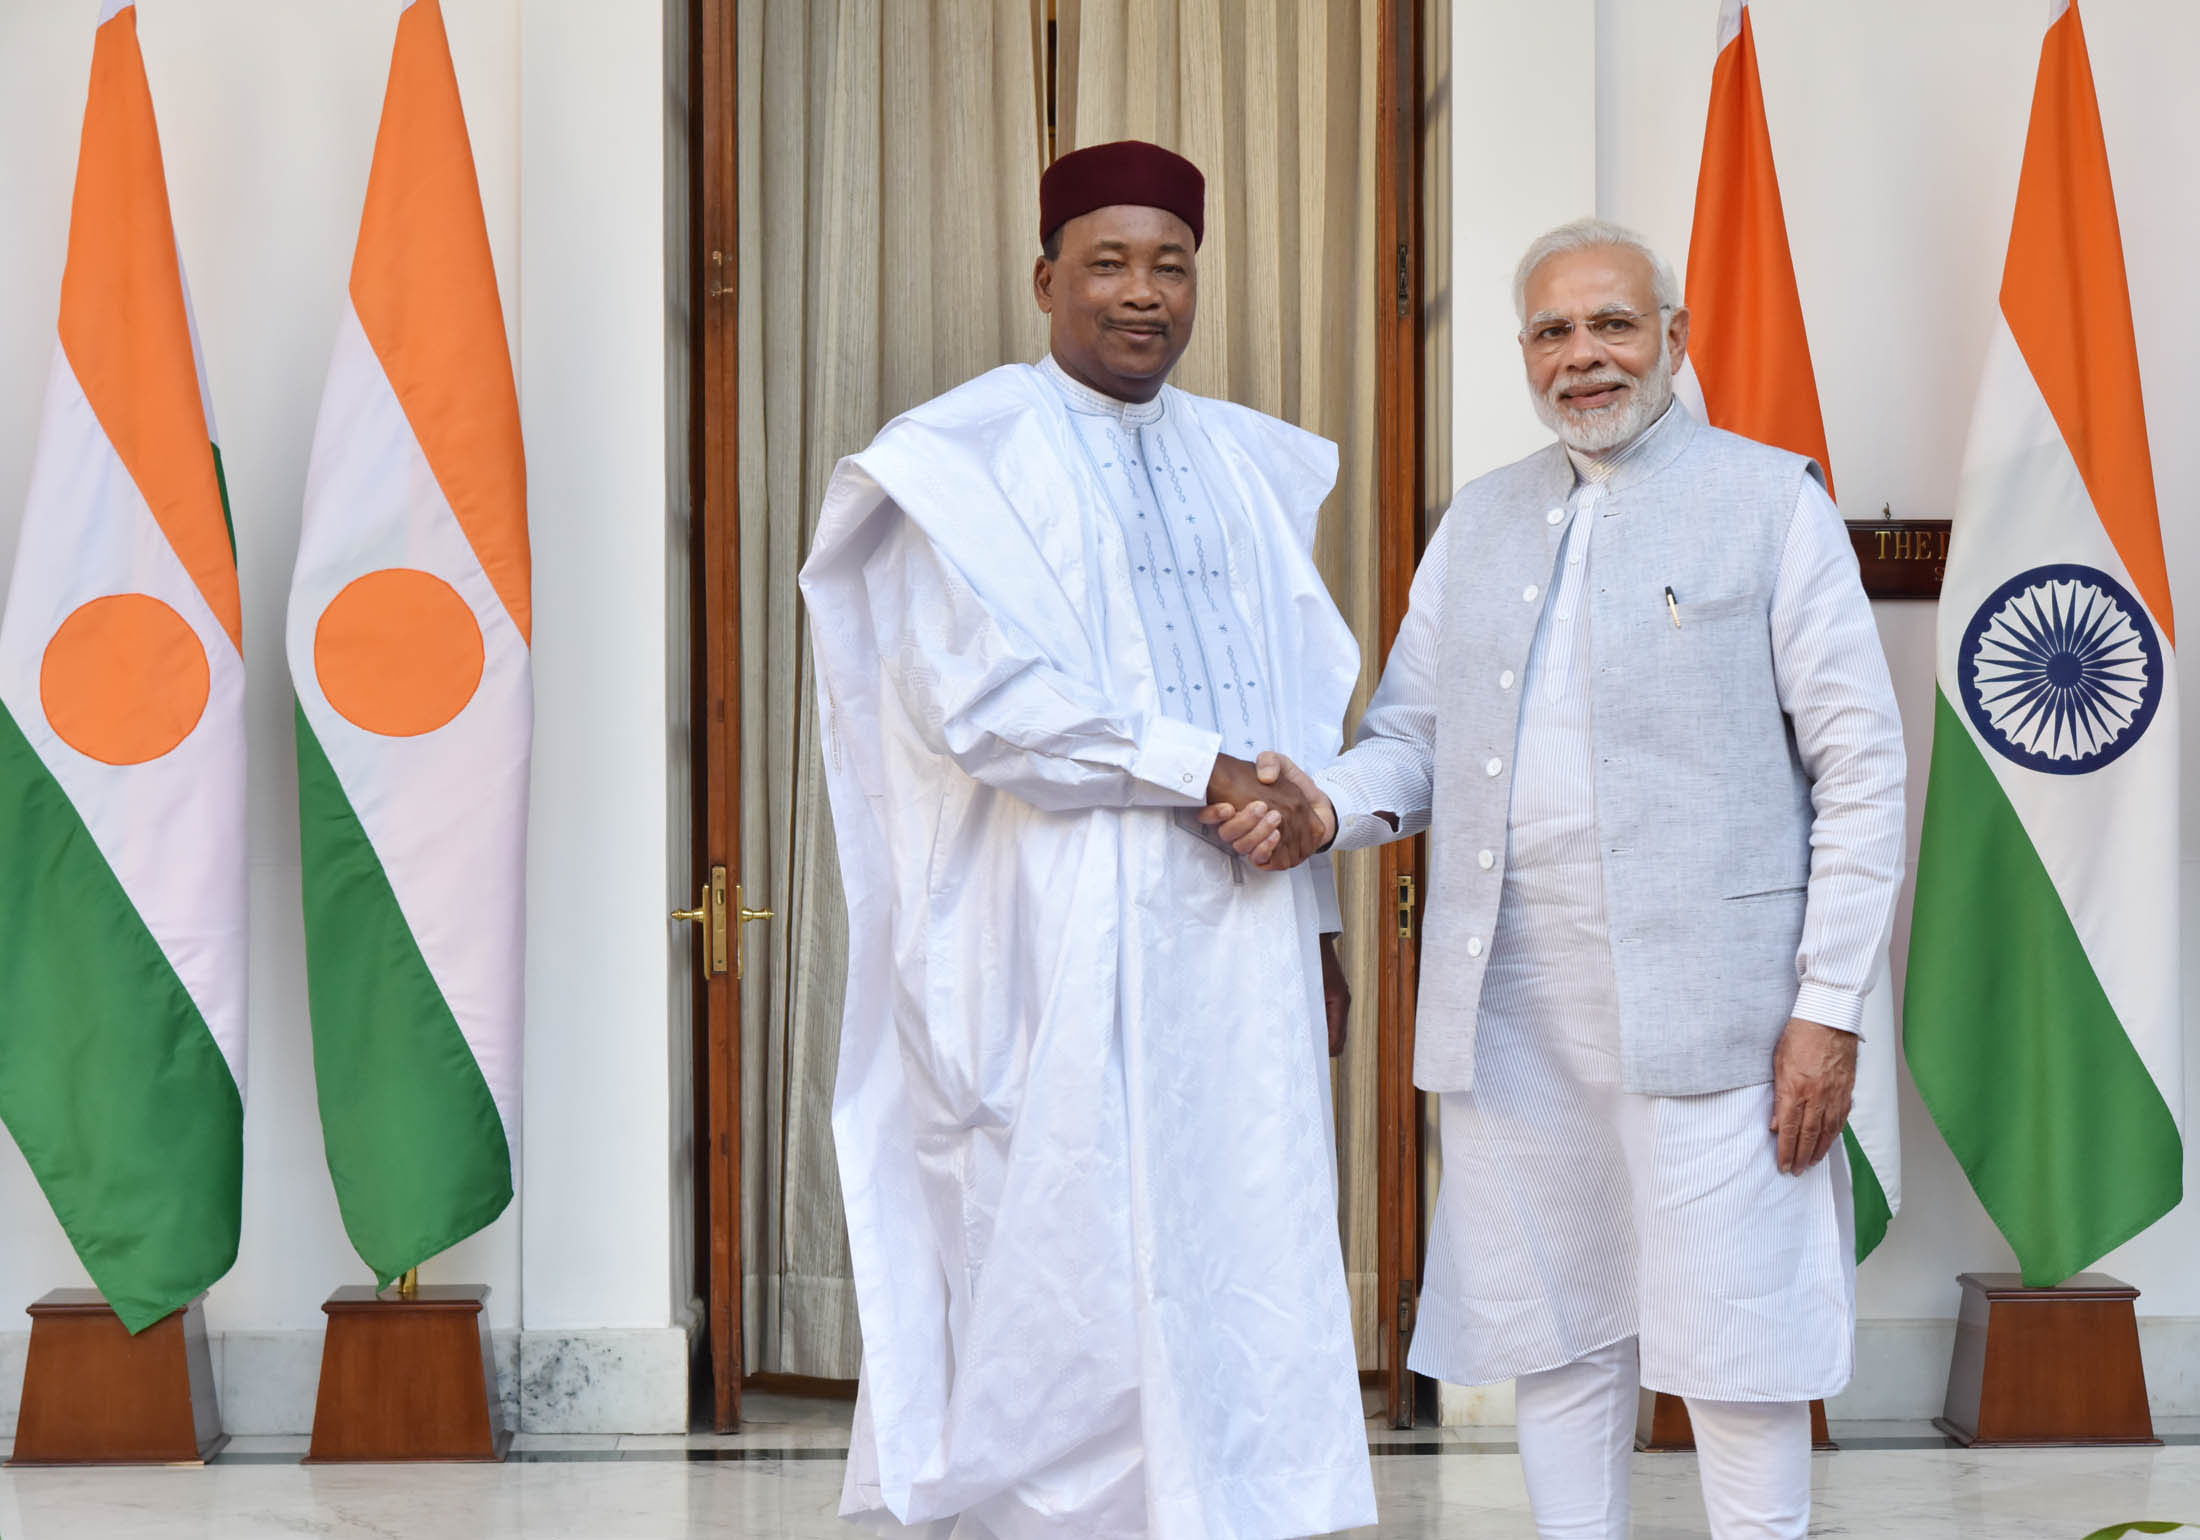 Prime Minister, Shri Narendra Modi with the President of Niger, Mr. Issoufou Mahamadou.